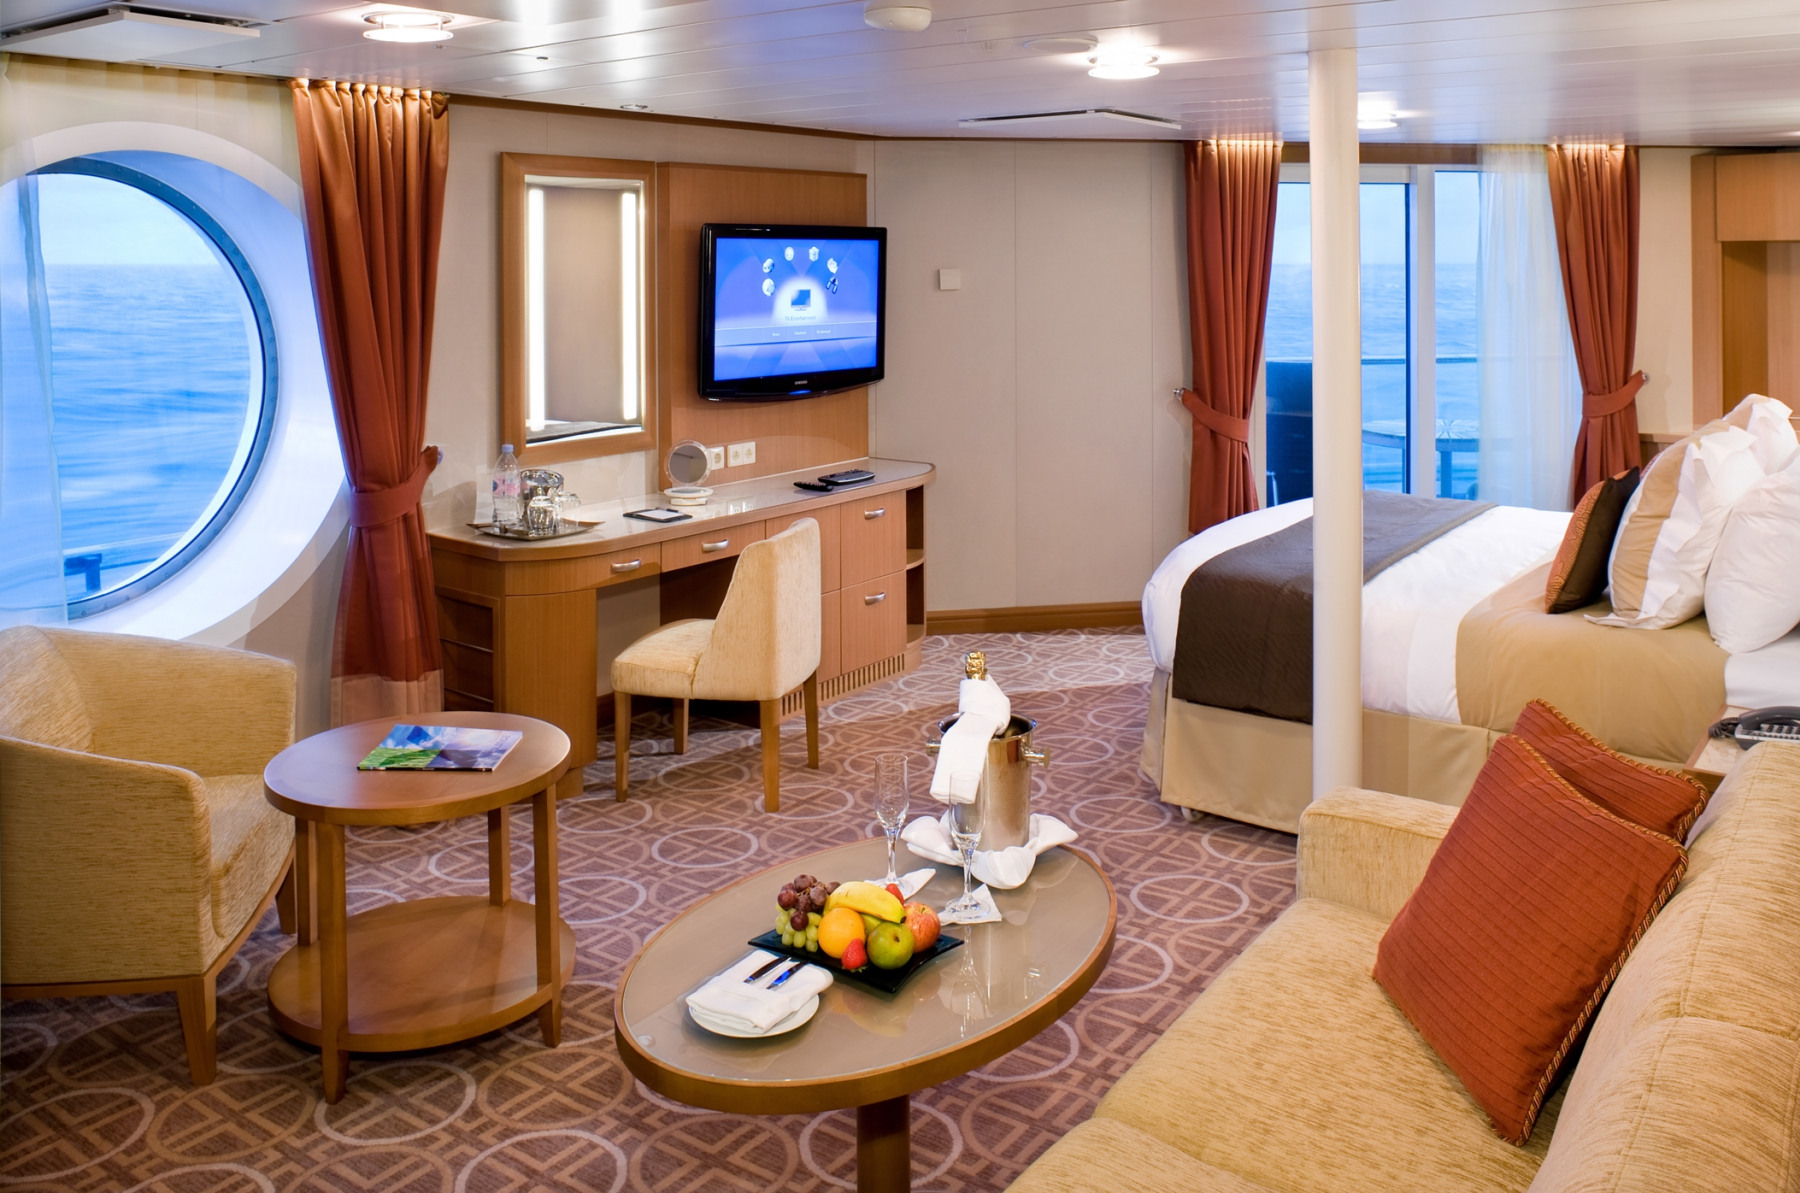 celebrity cruises celebrity solstice sky suite.jpg